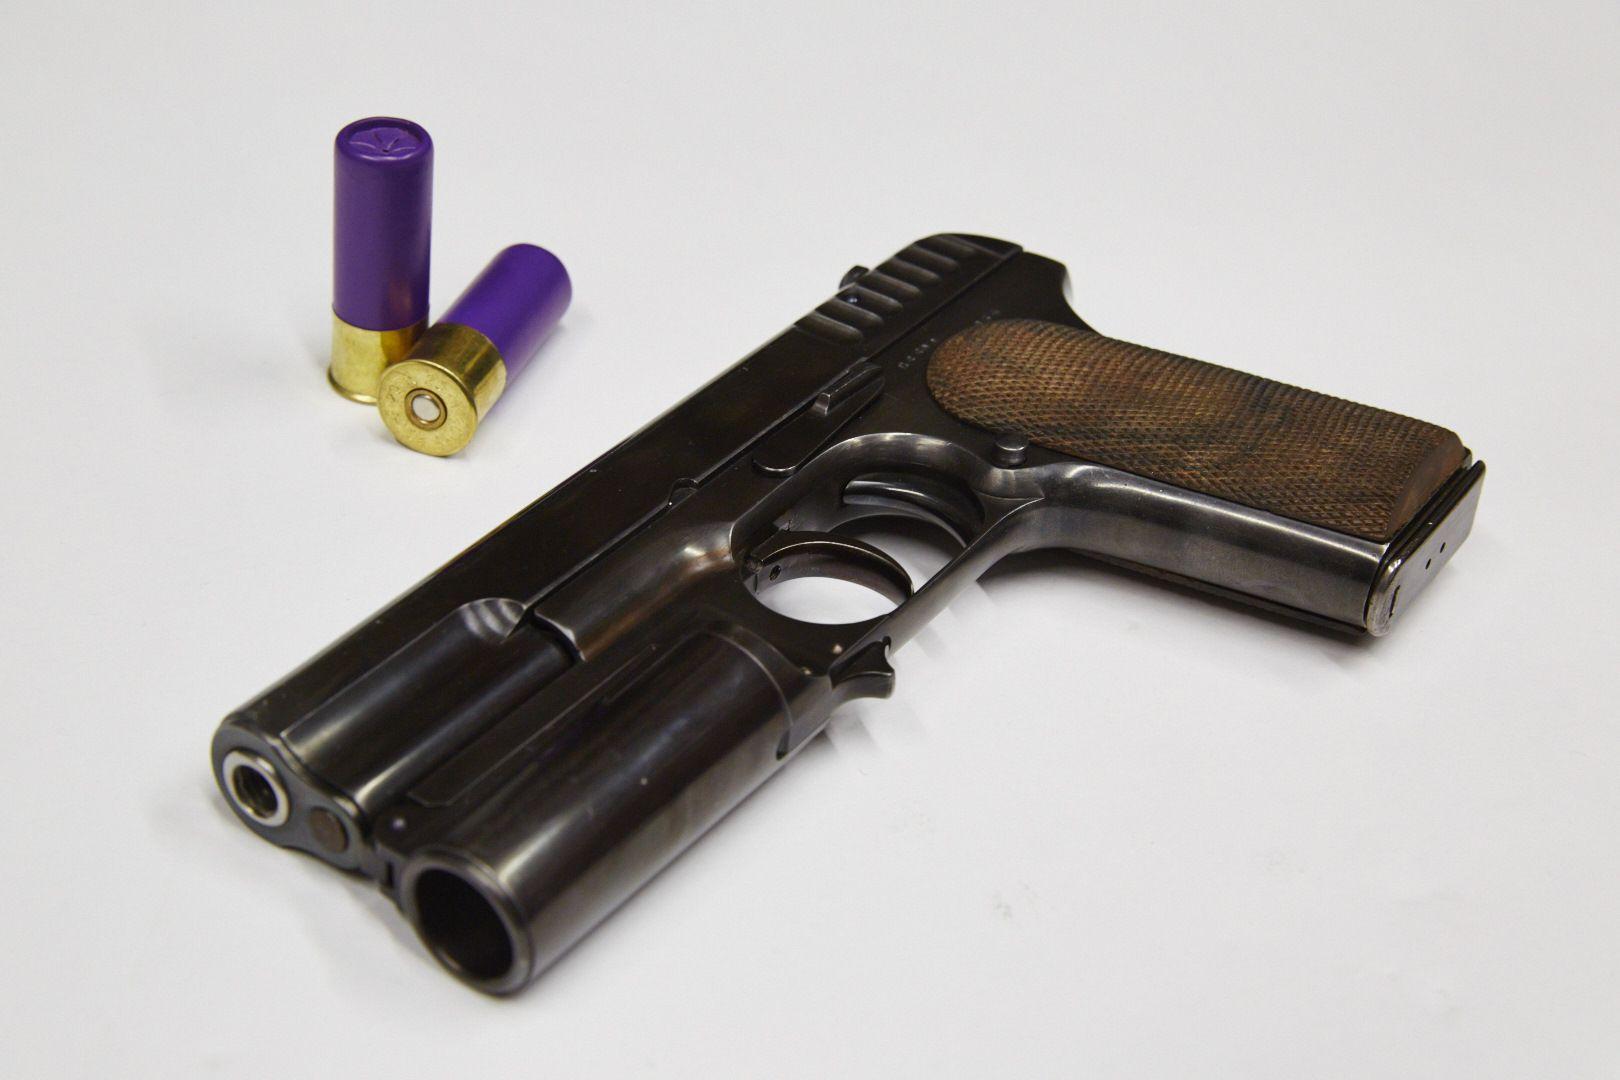 Pin on Toys YAAAYYY! (guns)